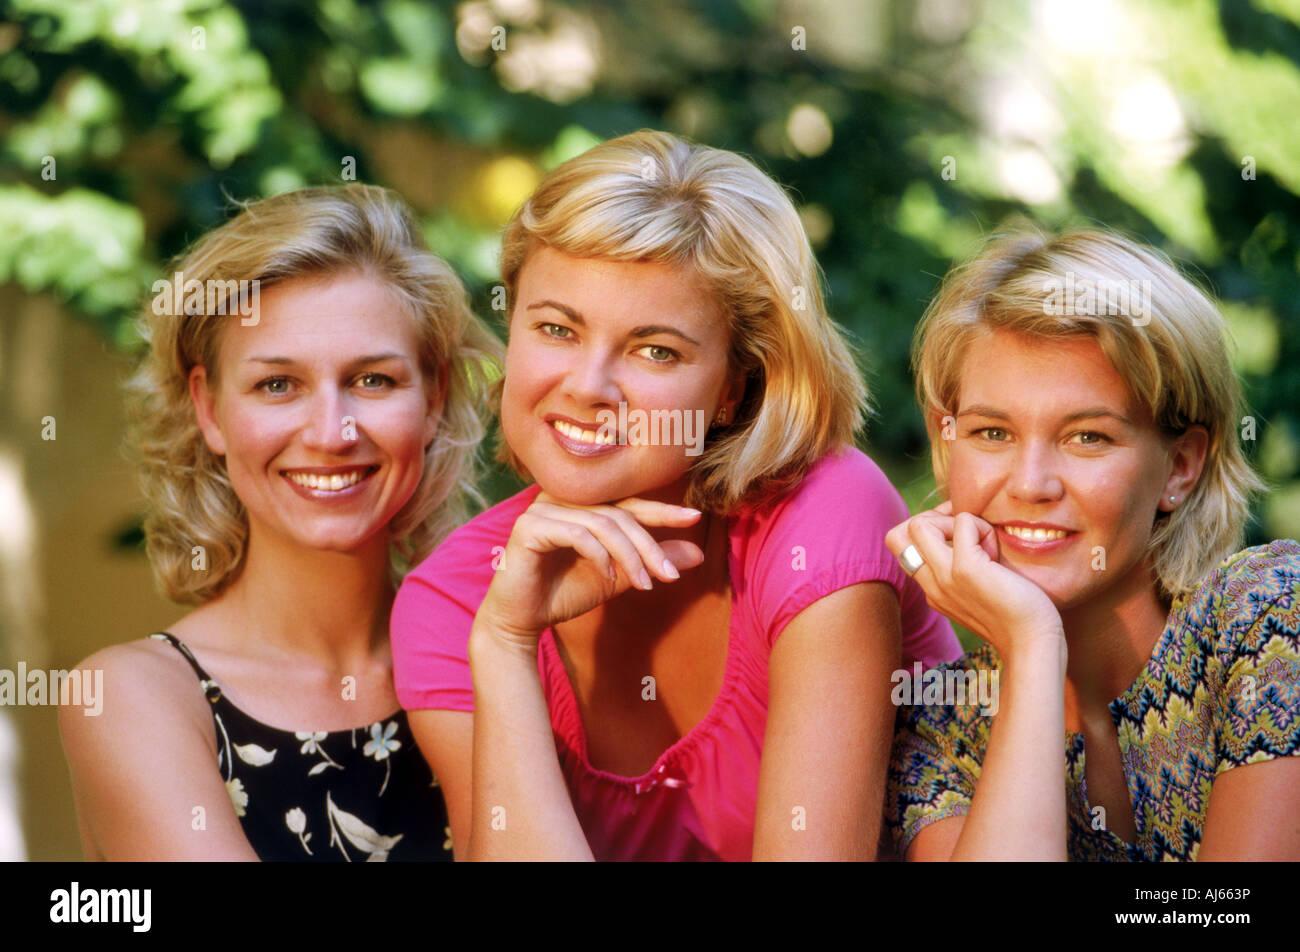 Three smiling Swedish women - Stock Image